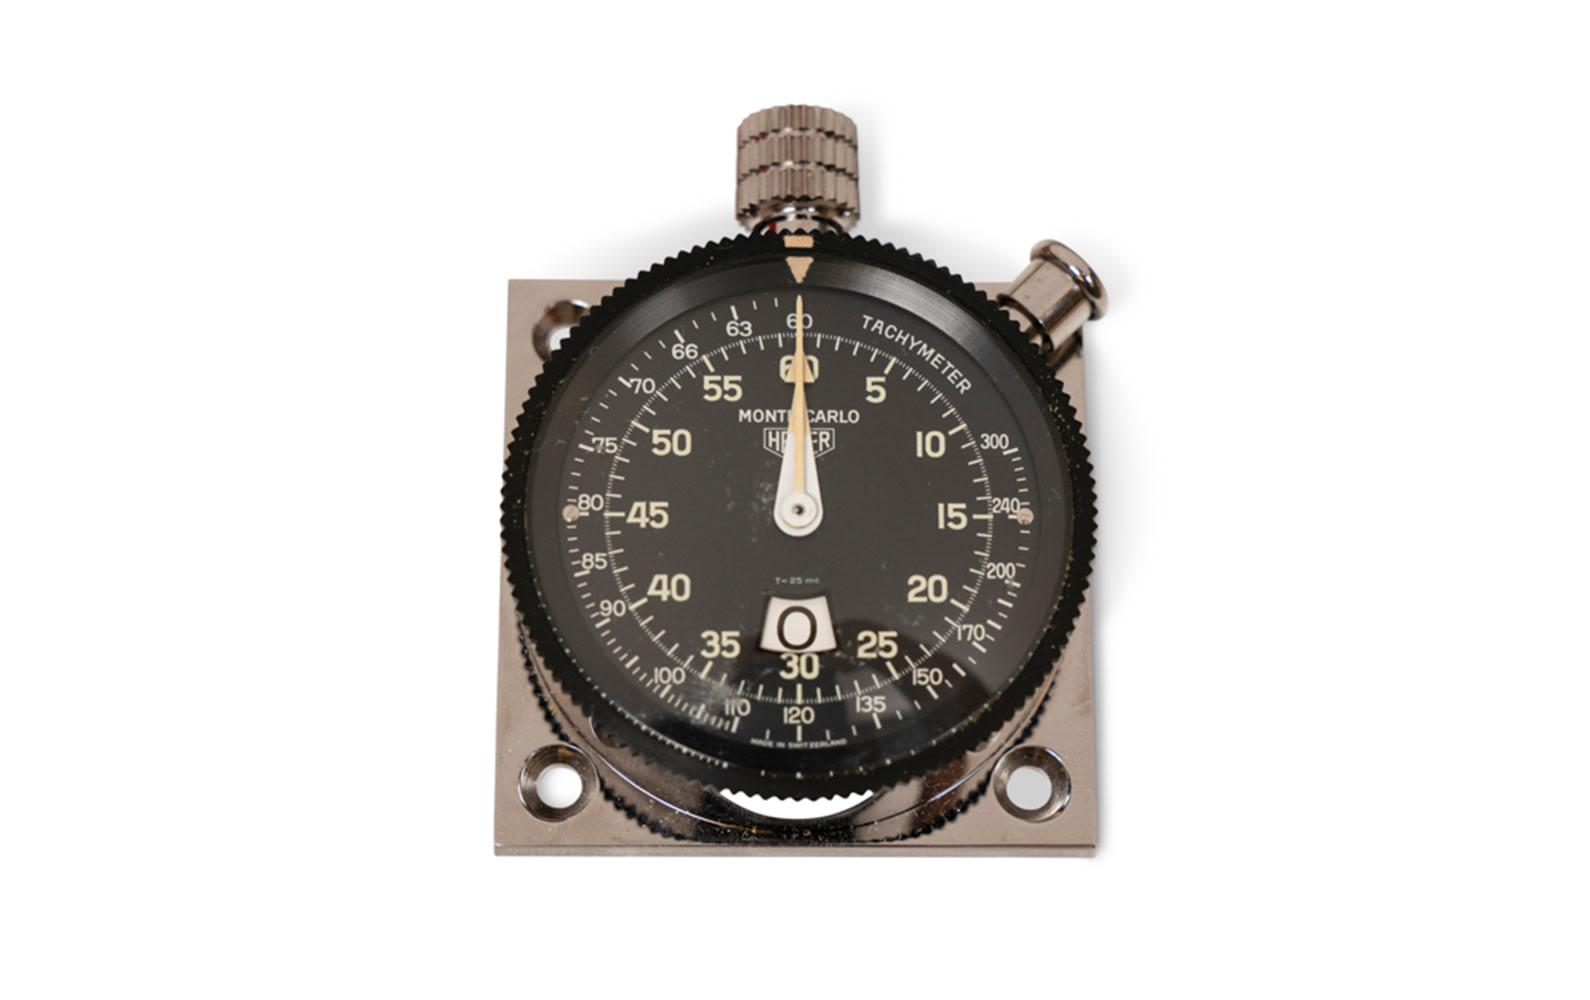 Heuer Monte-Carlo Stopwatch, Ref. 542.701 8487